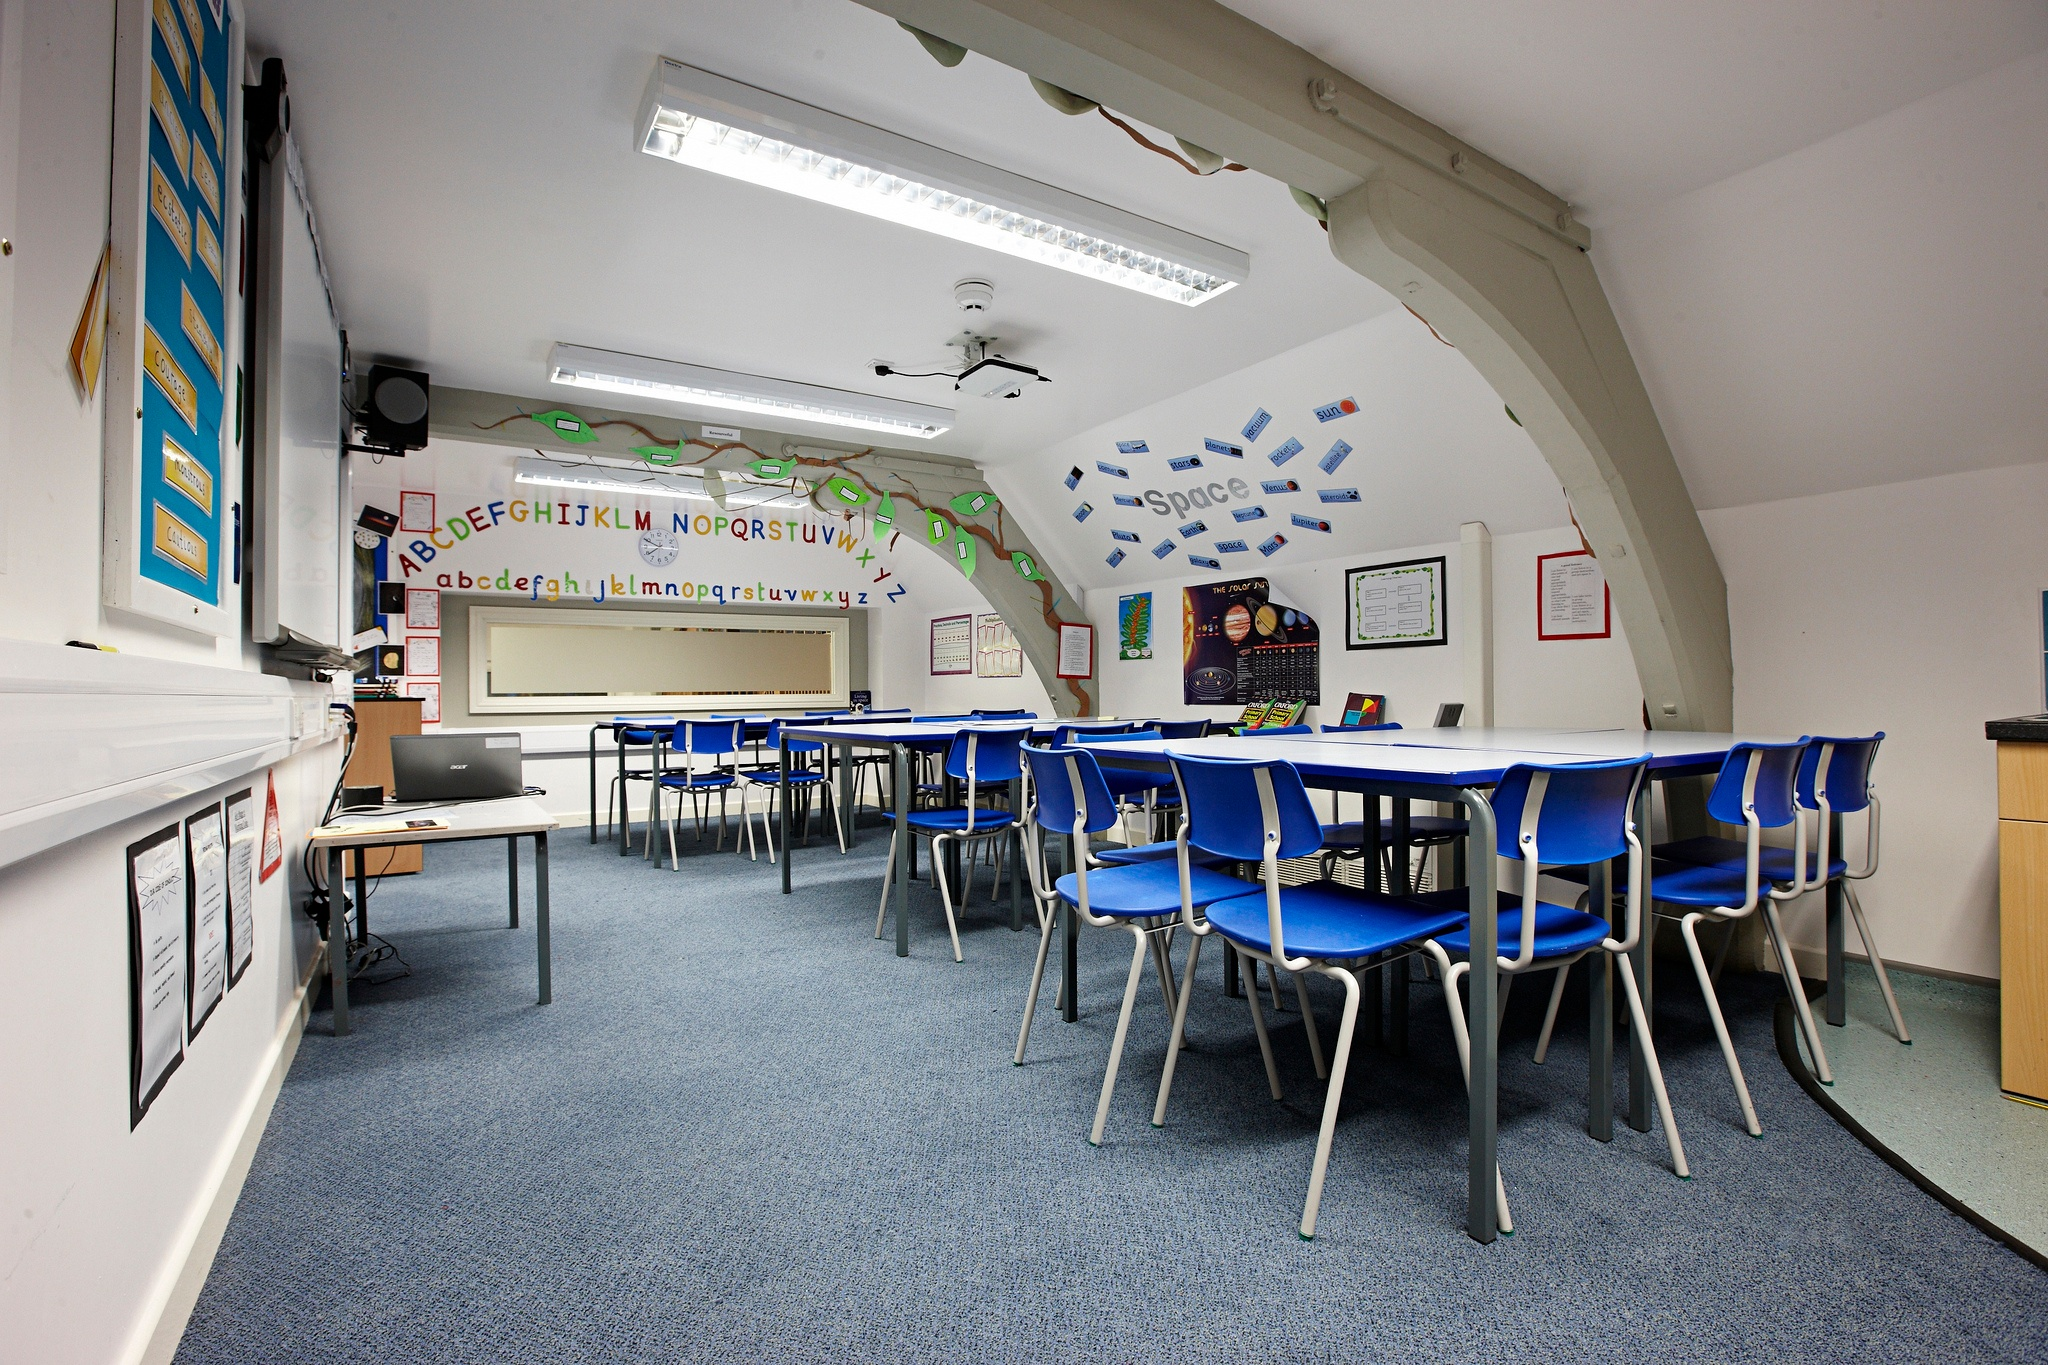 transition strip in classroom education school.jpg